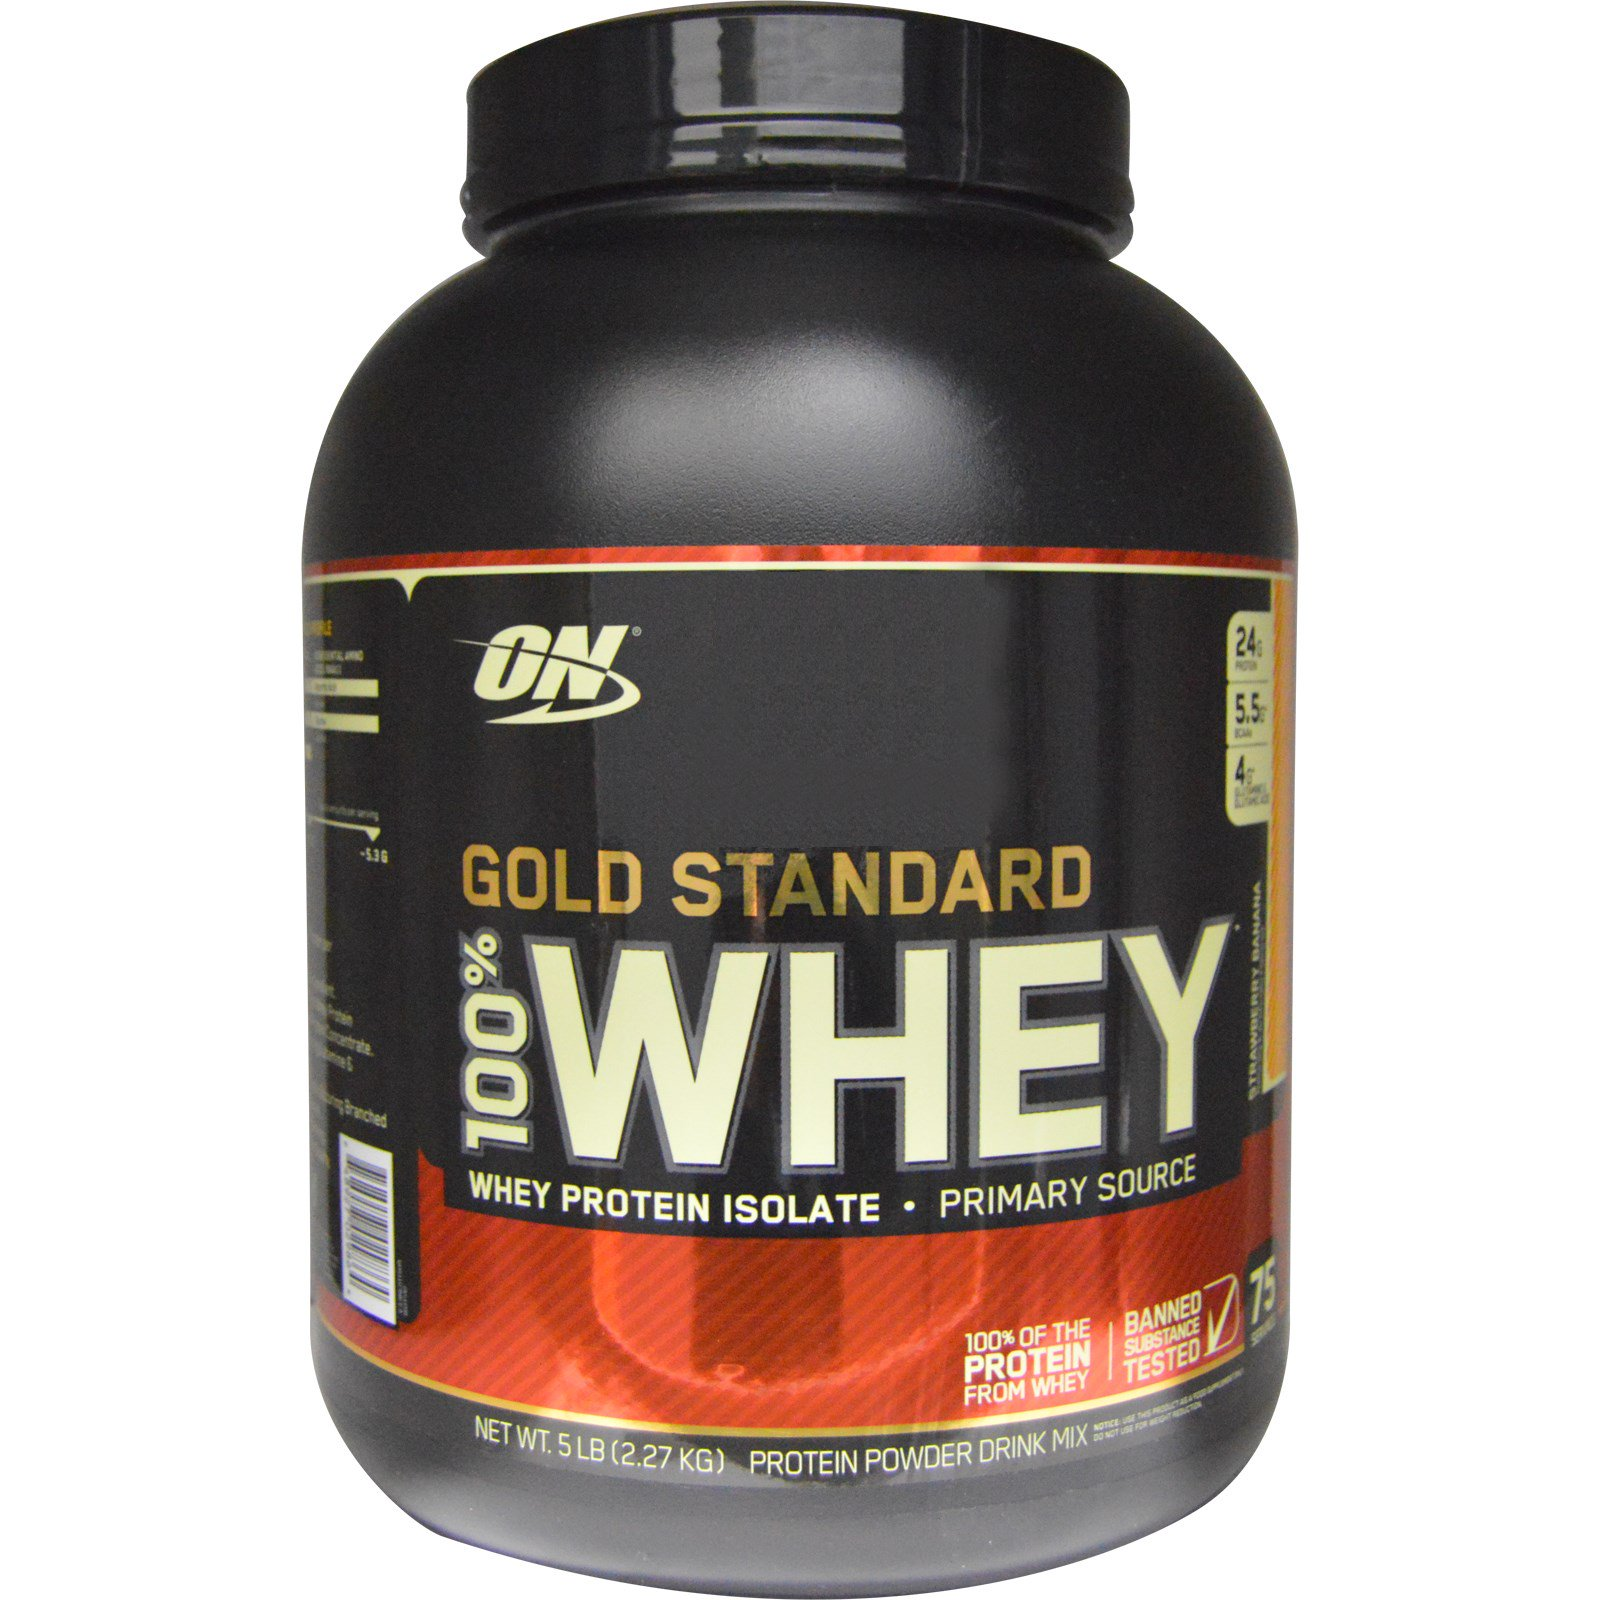 Optimum Nutrition, Gold Standard, 100% Whey, Strawberry Banana, 5 lbs (2.27 kg) - iHerb.com